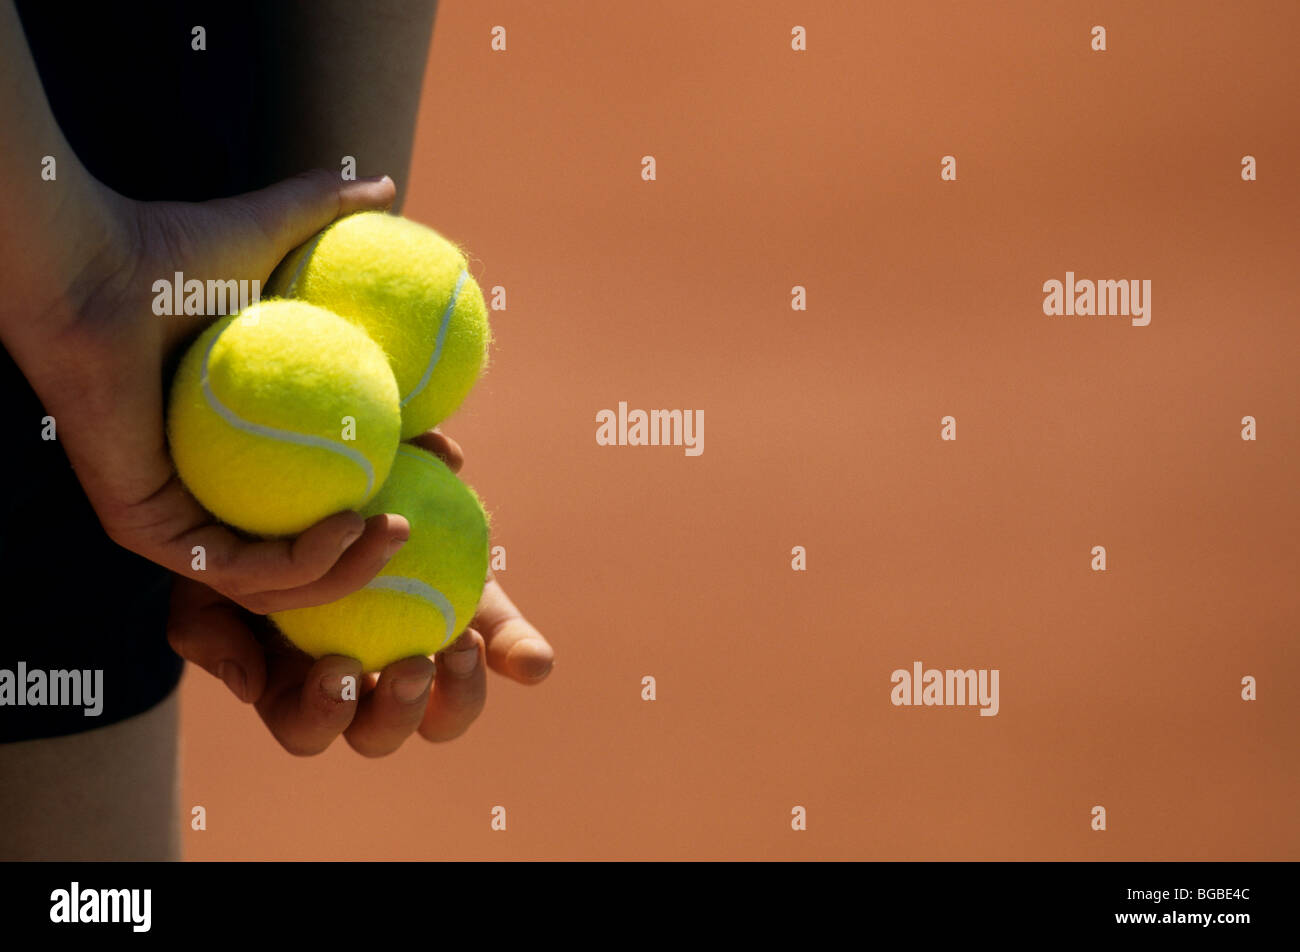 Close up of a ball boy holding tennis balls - Stock Image